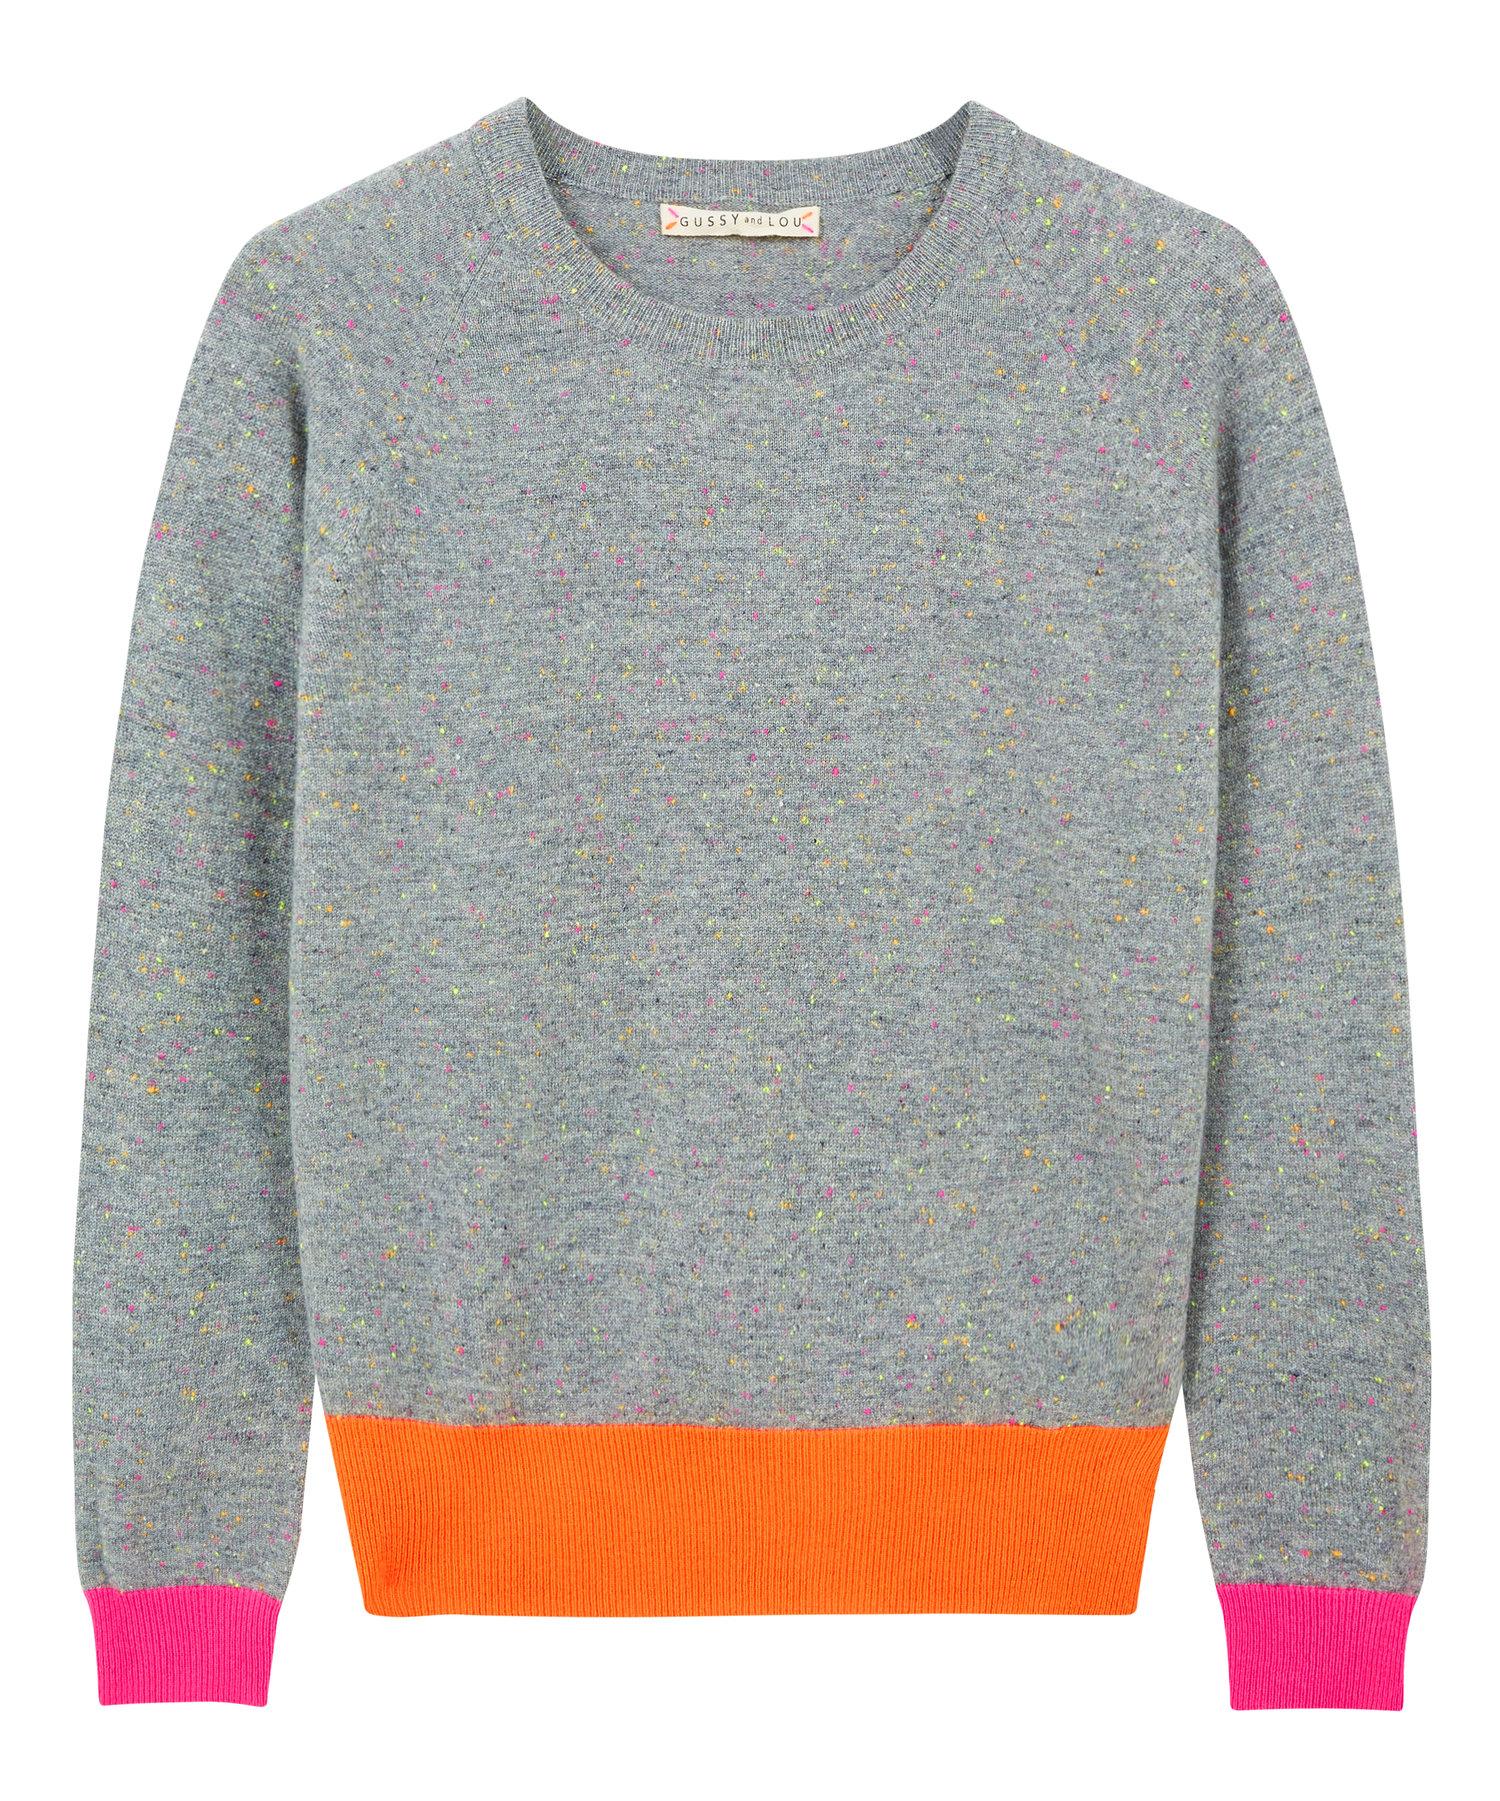 Ladies+Jumper_Gray+Neon+Orange+Pink_F.jpg